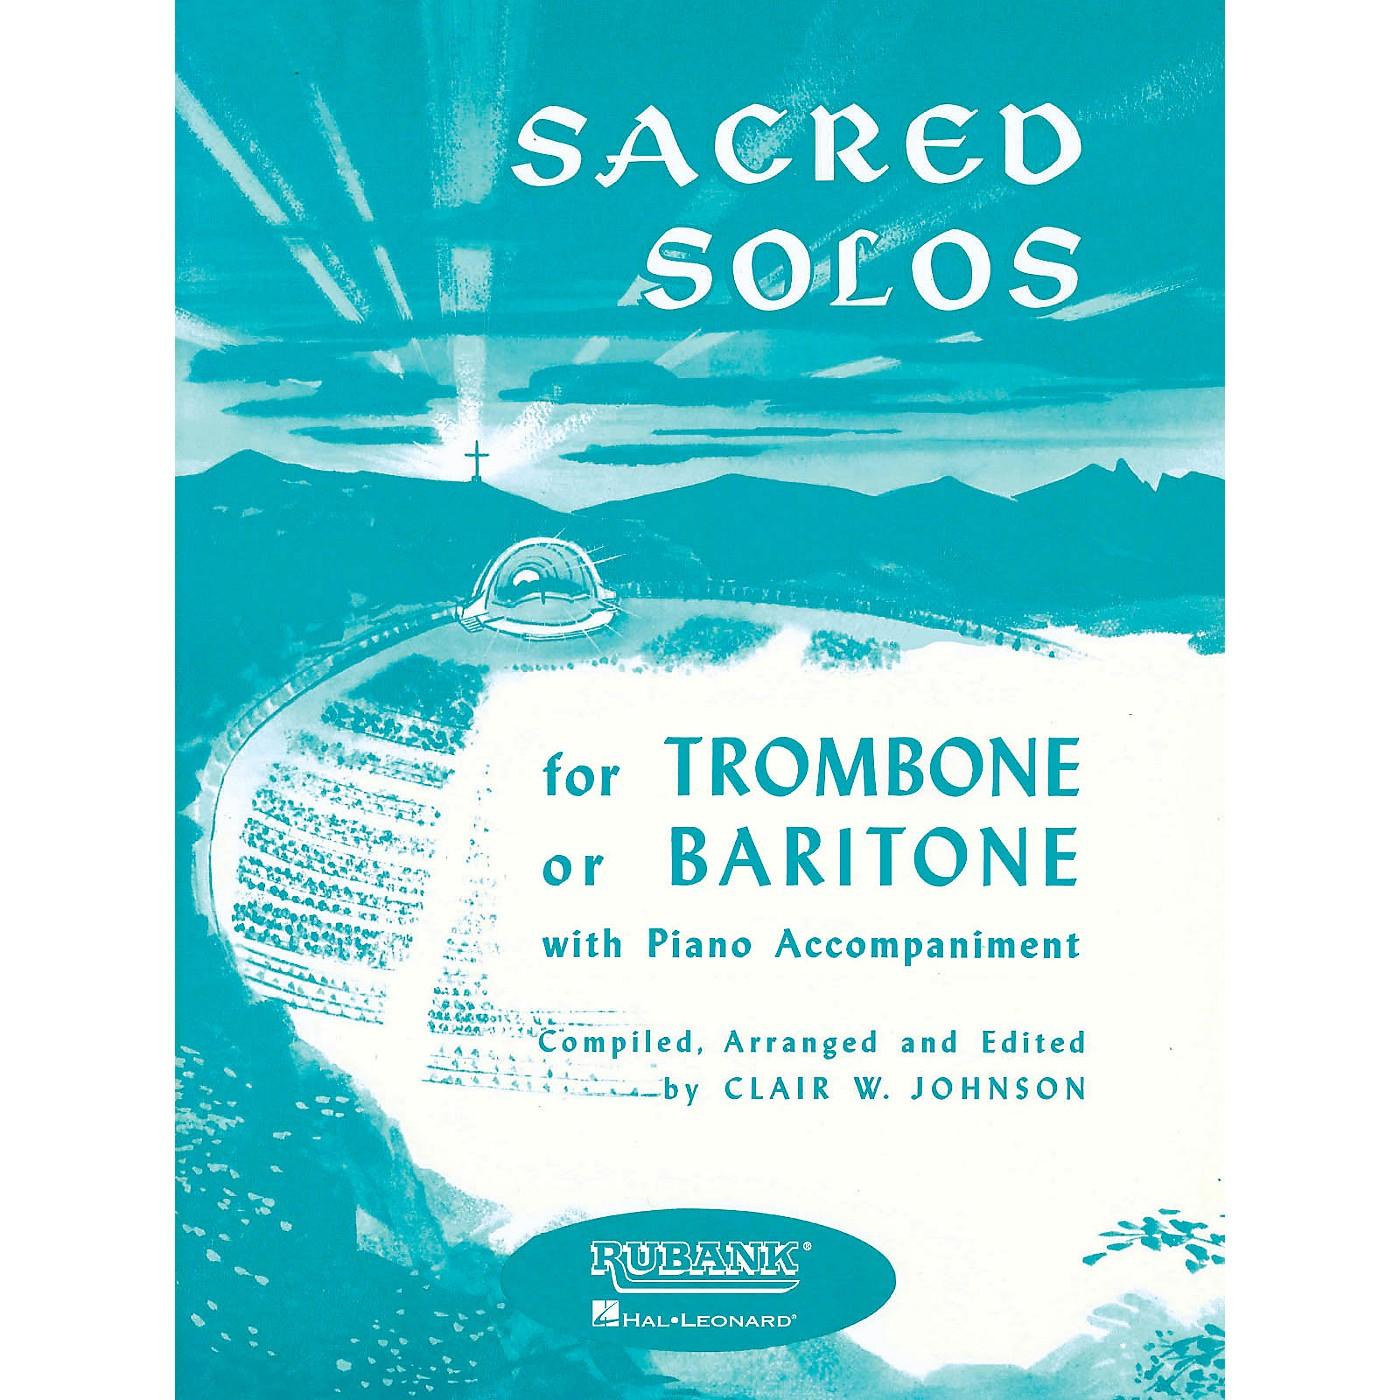 Rubank Publications Sacred Solos (Trombone (Baritone B.C.) Solo with Piano) Rubank Solo Collection Series thumbnail